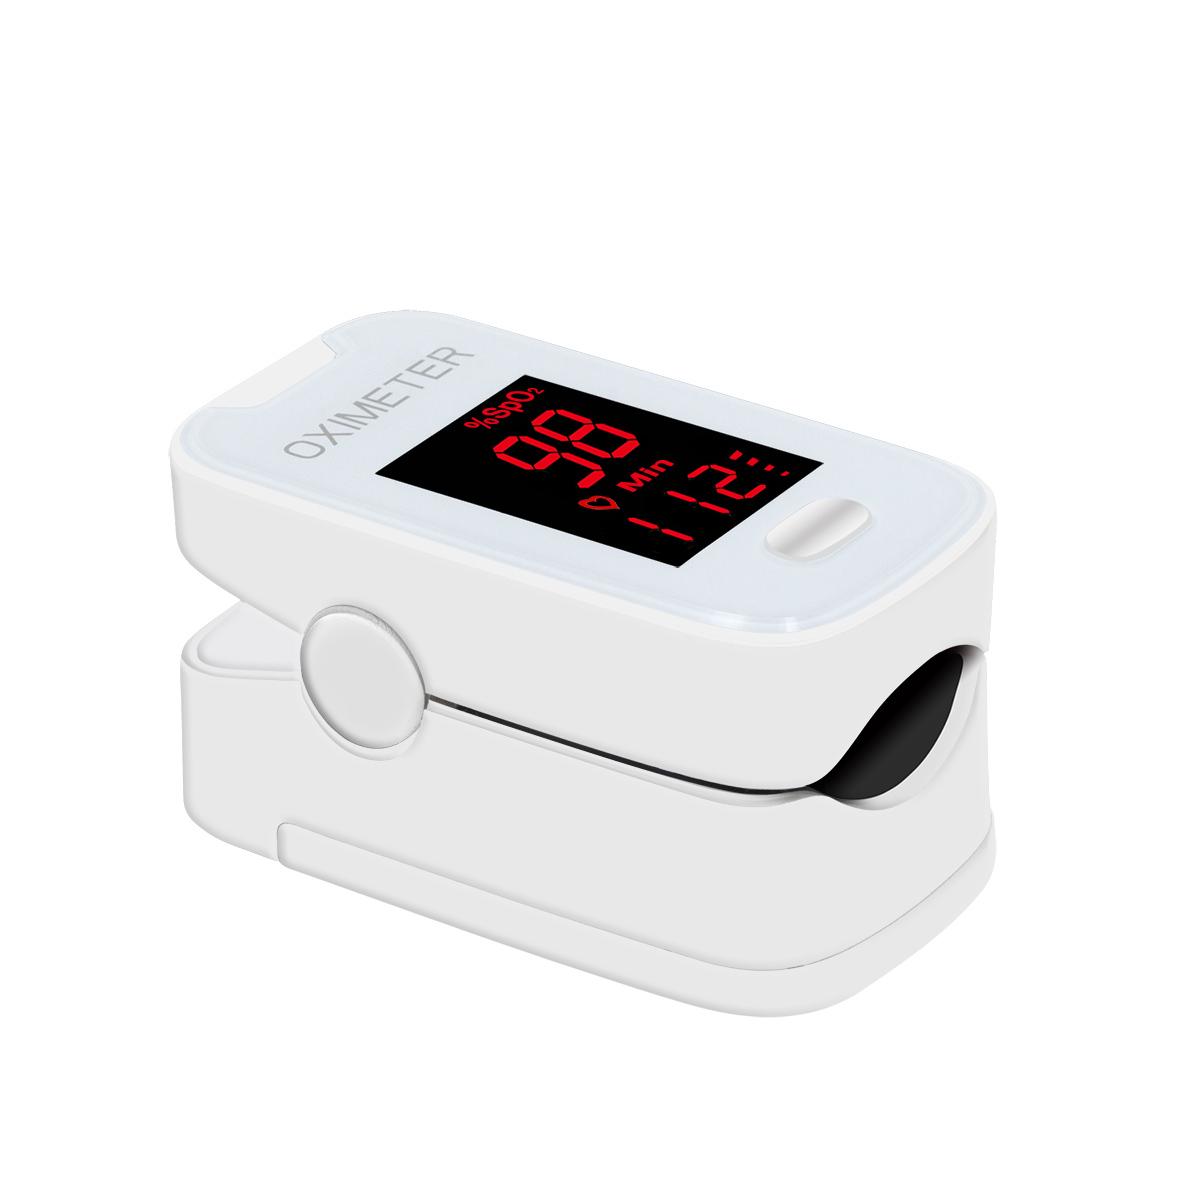 Medical Portable Pulse Oximeter LED Spo2 Blood Oxygen Heart Rate Monitor Household Health